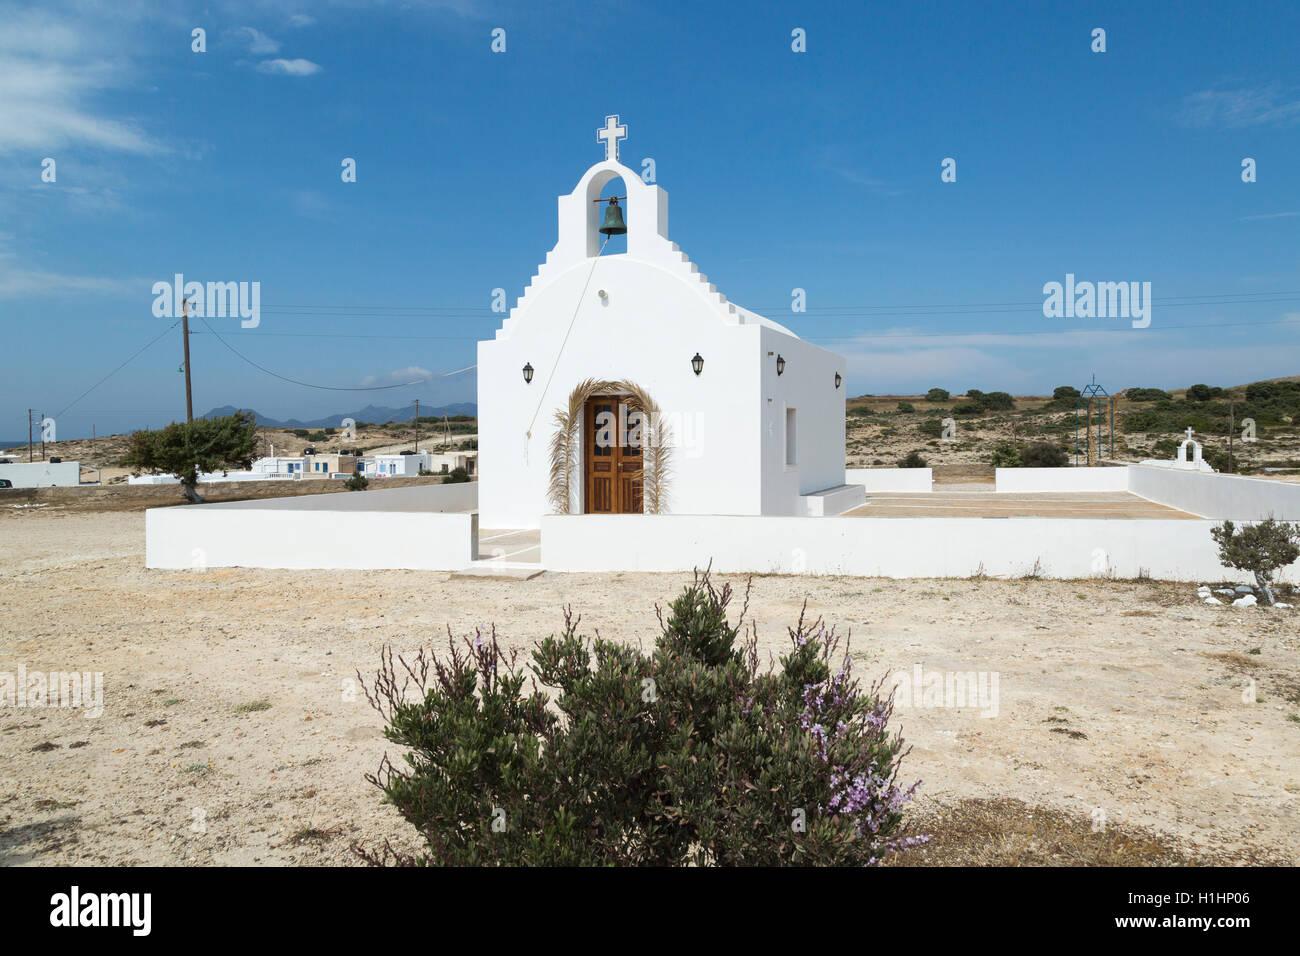 Church in Agios Konstantinos on the island of Milos Greece - Stock Image